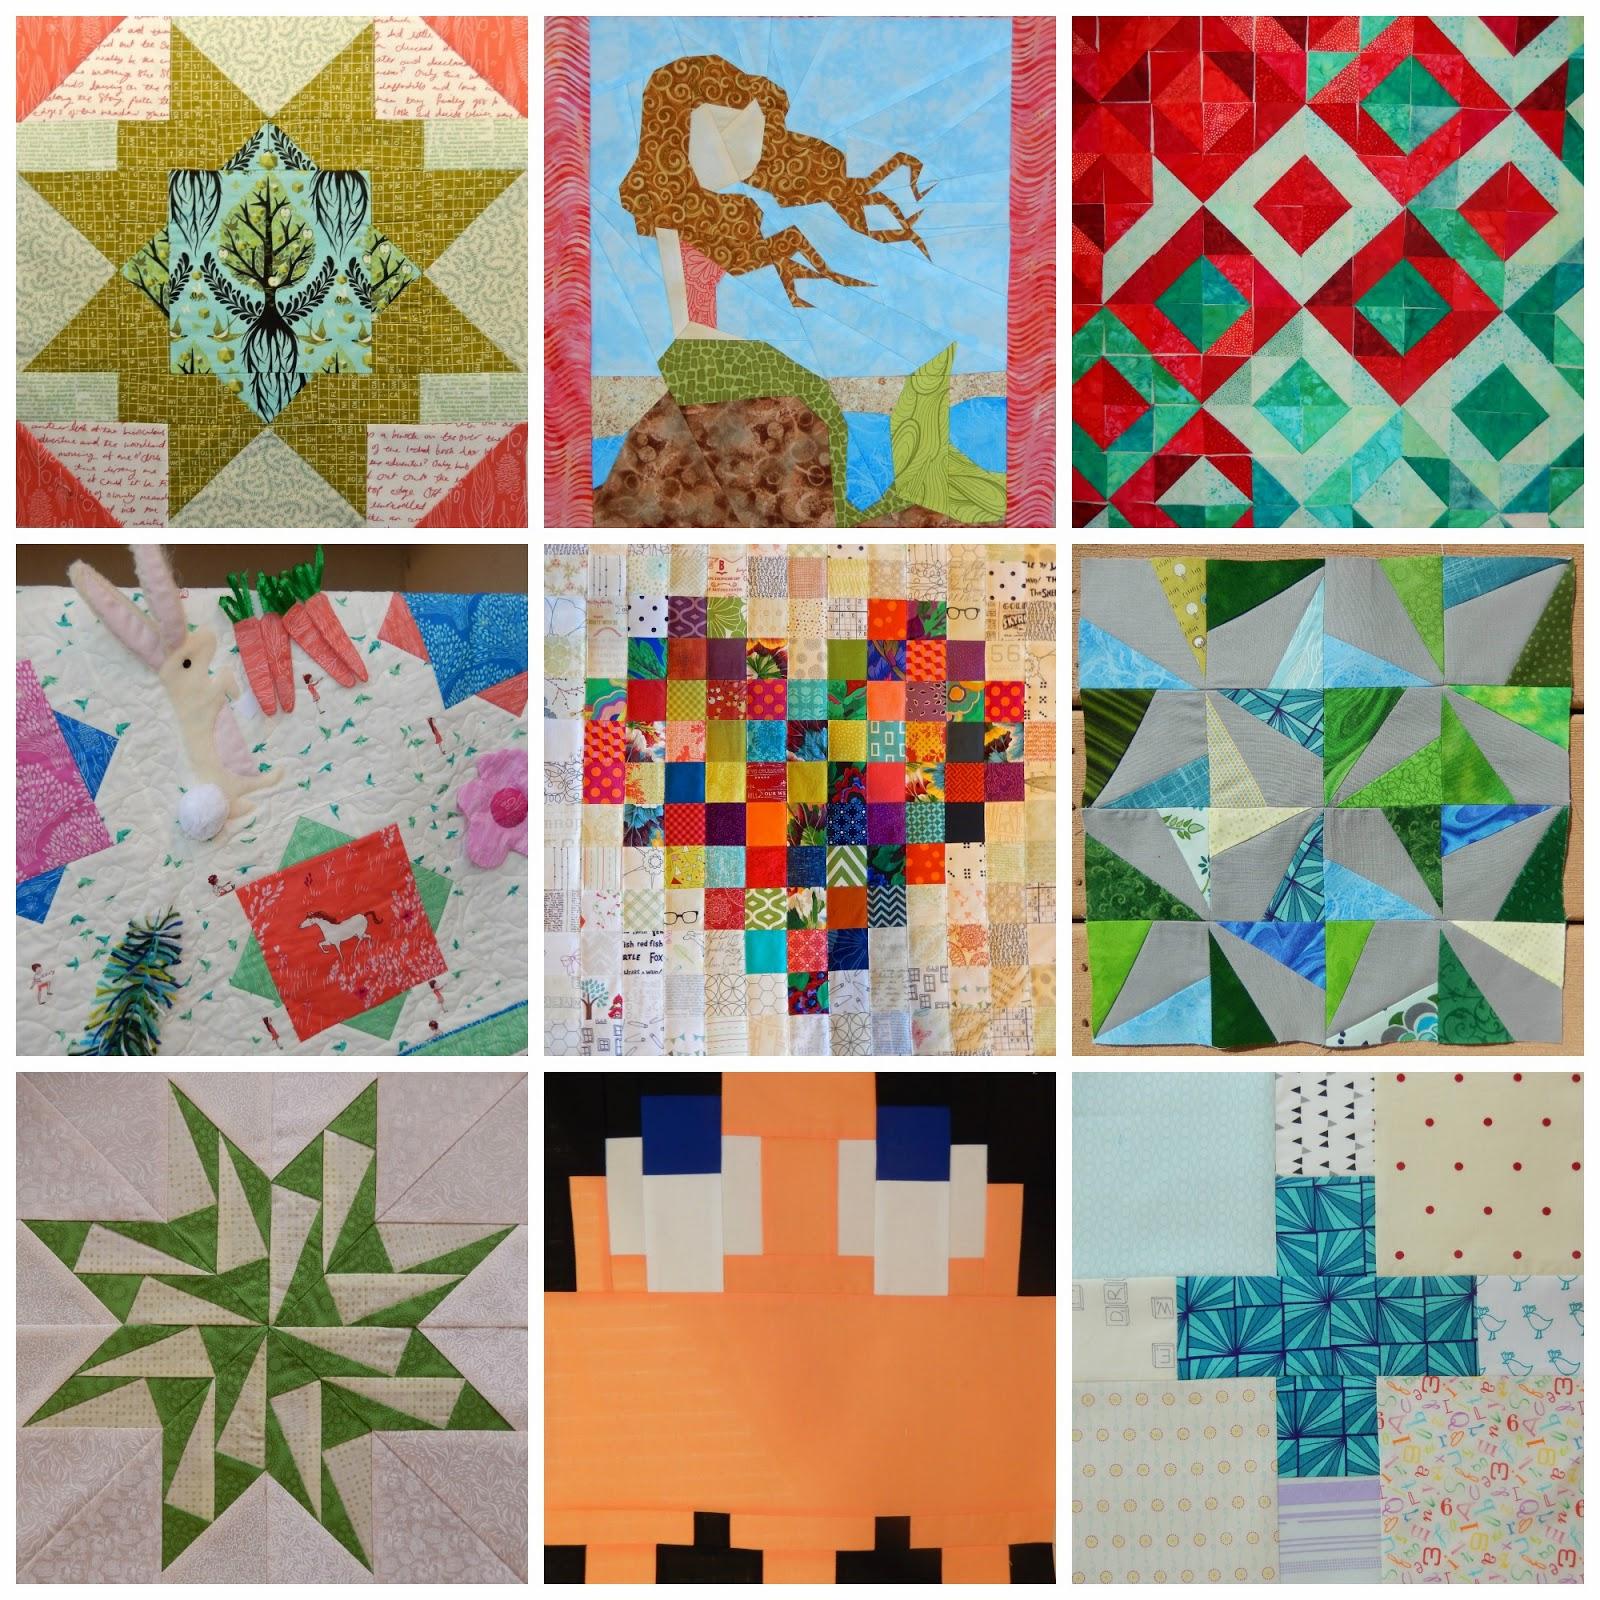 Afton Warrick @ Quilting Mod www.quiltingmod.blogspot.com Project Mosaic